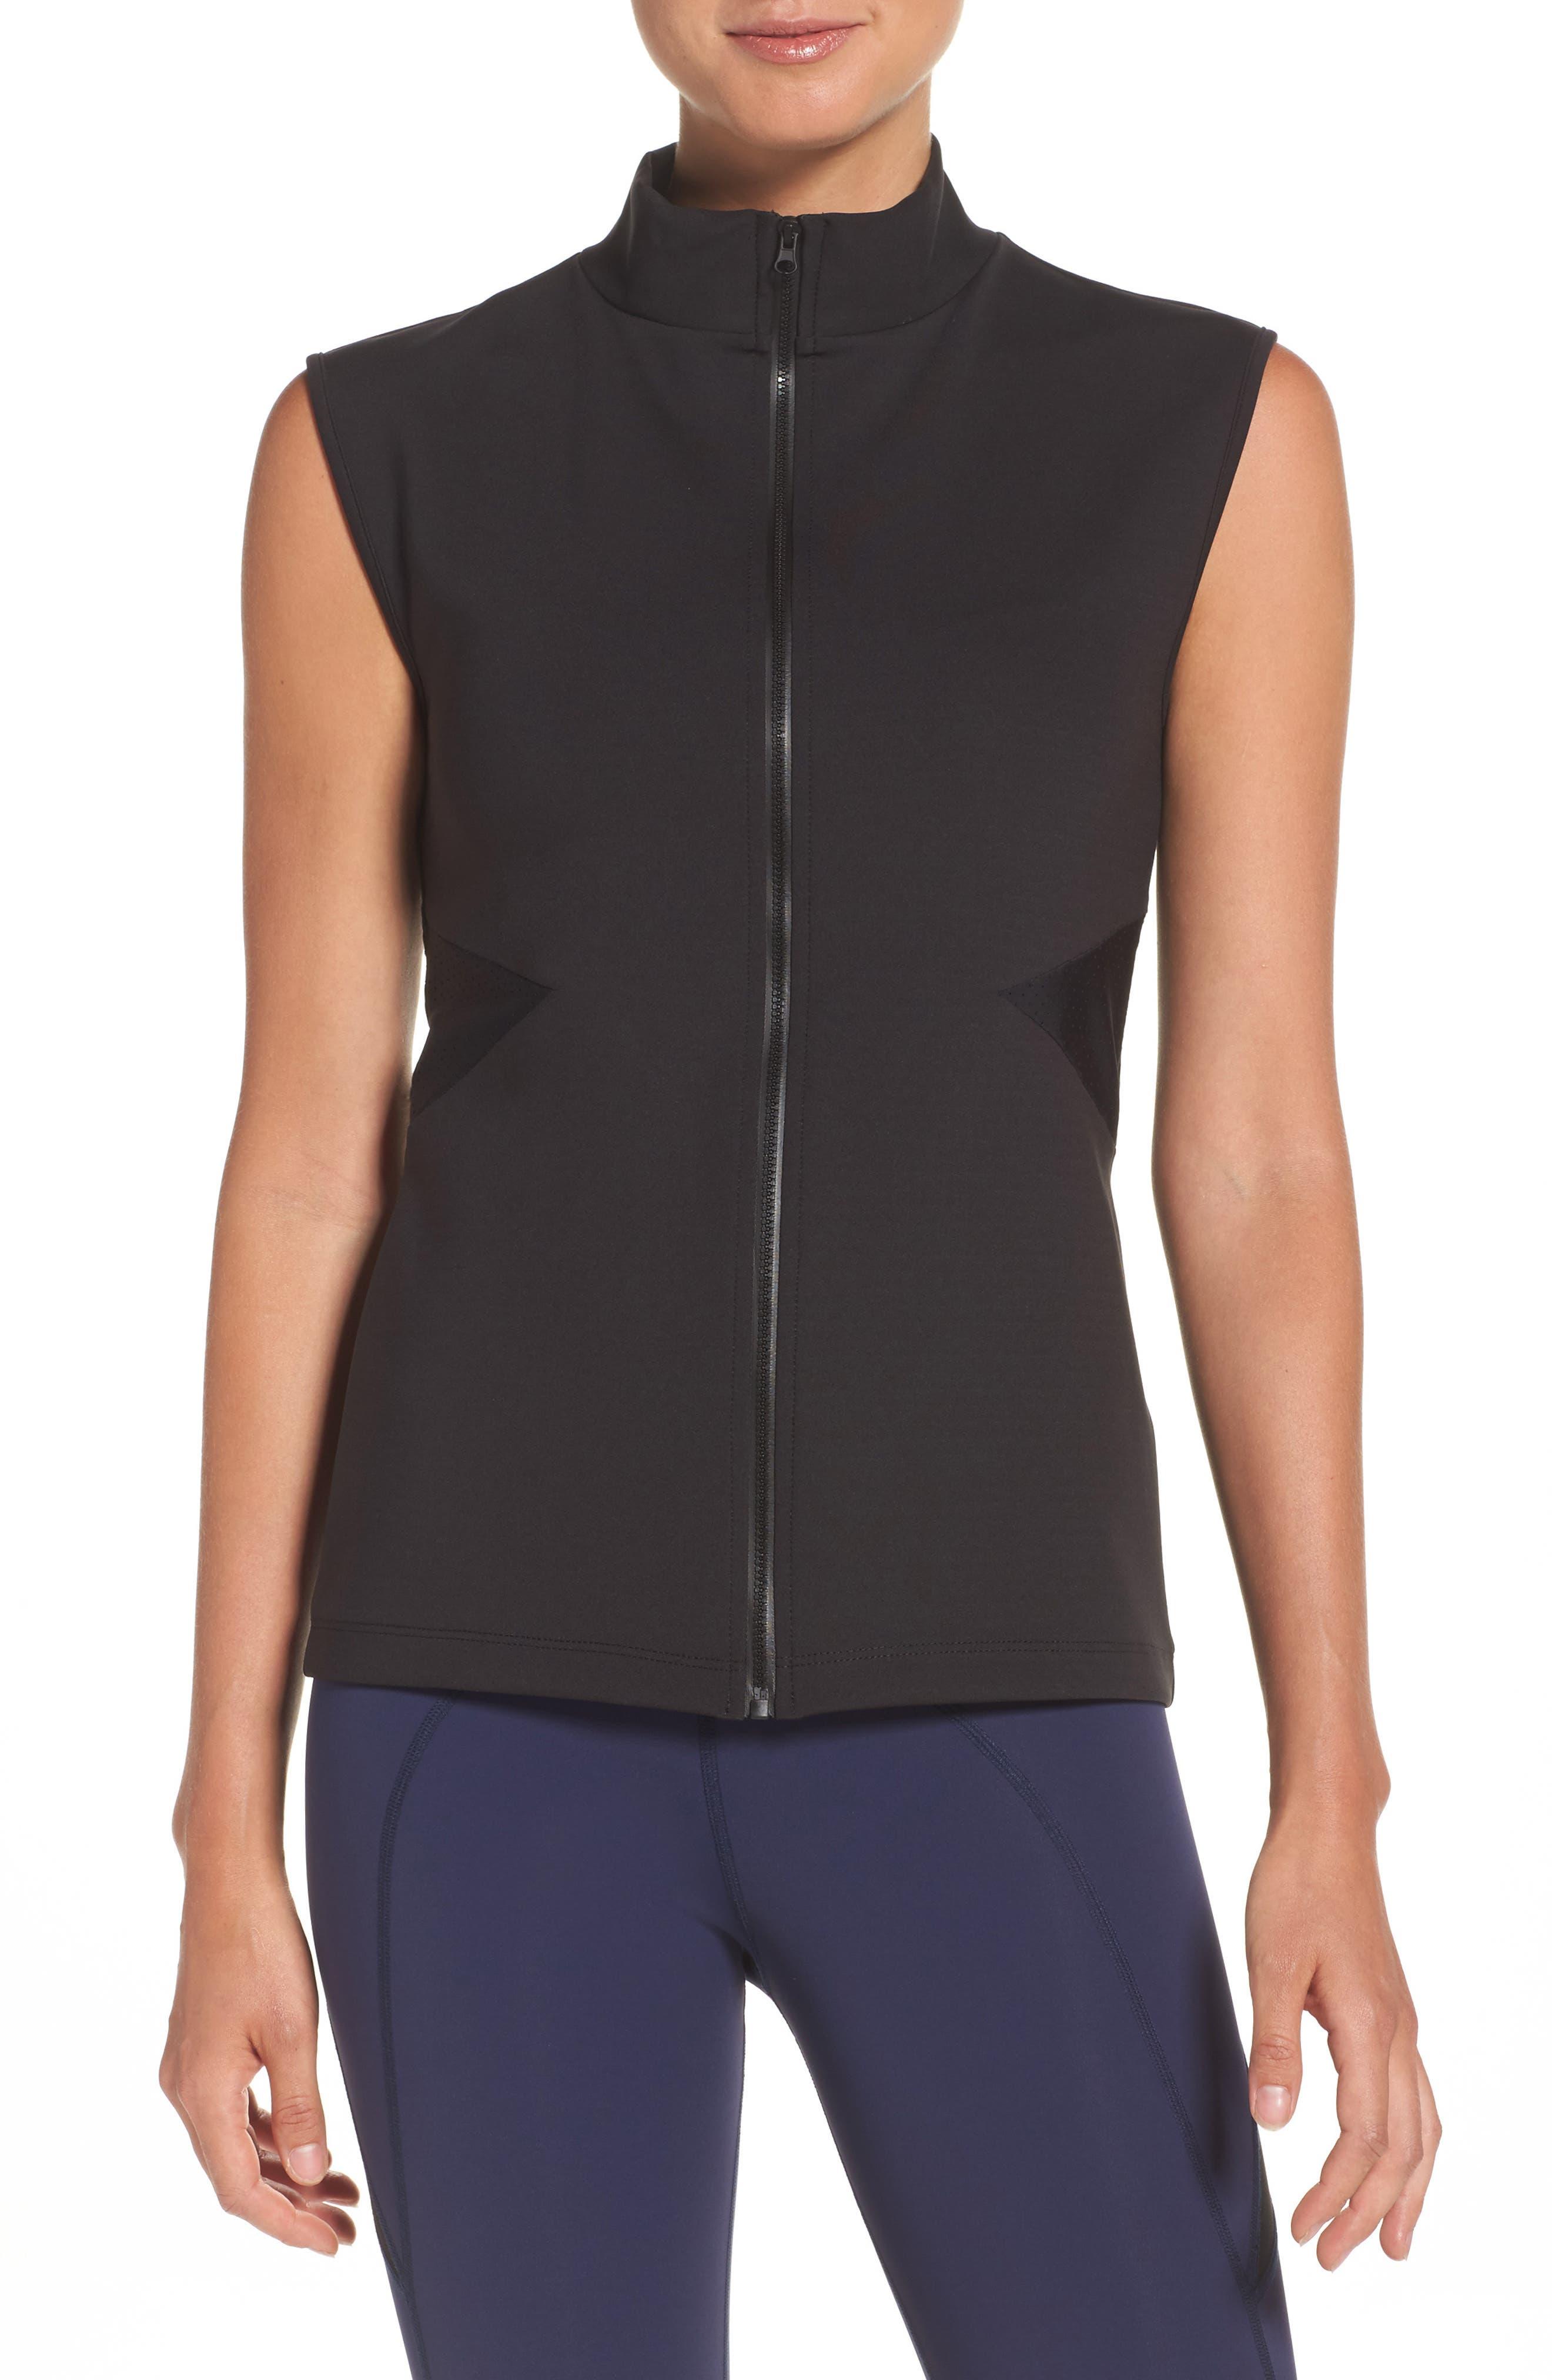 Alternate Image 1 Selected - BoomBoom Athletica Scuba Vest